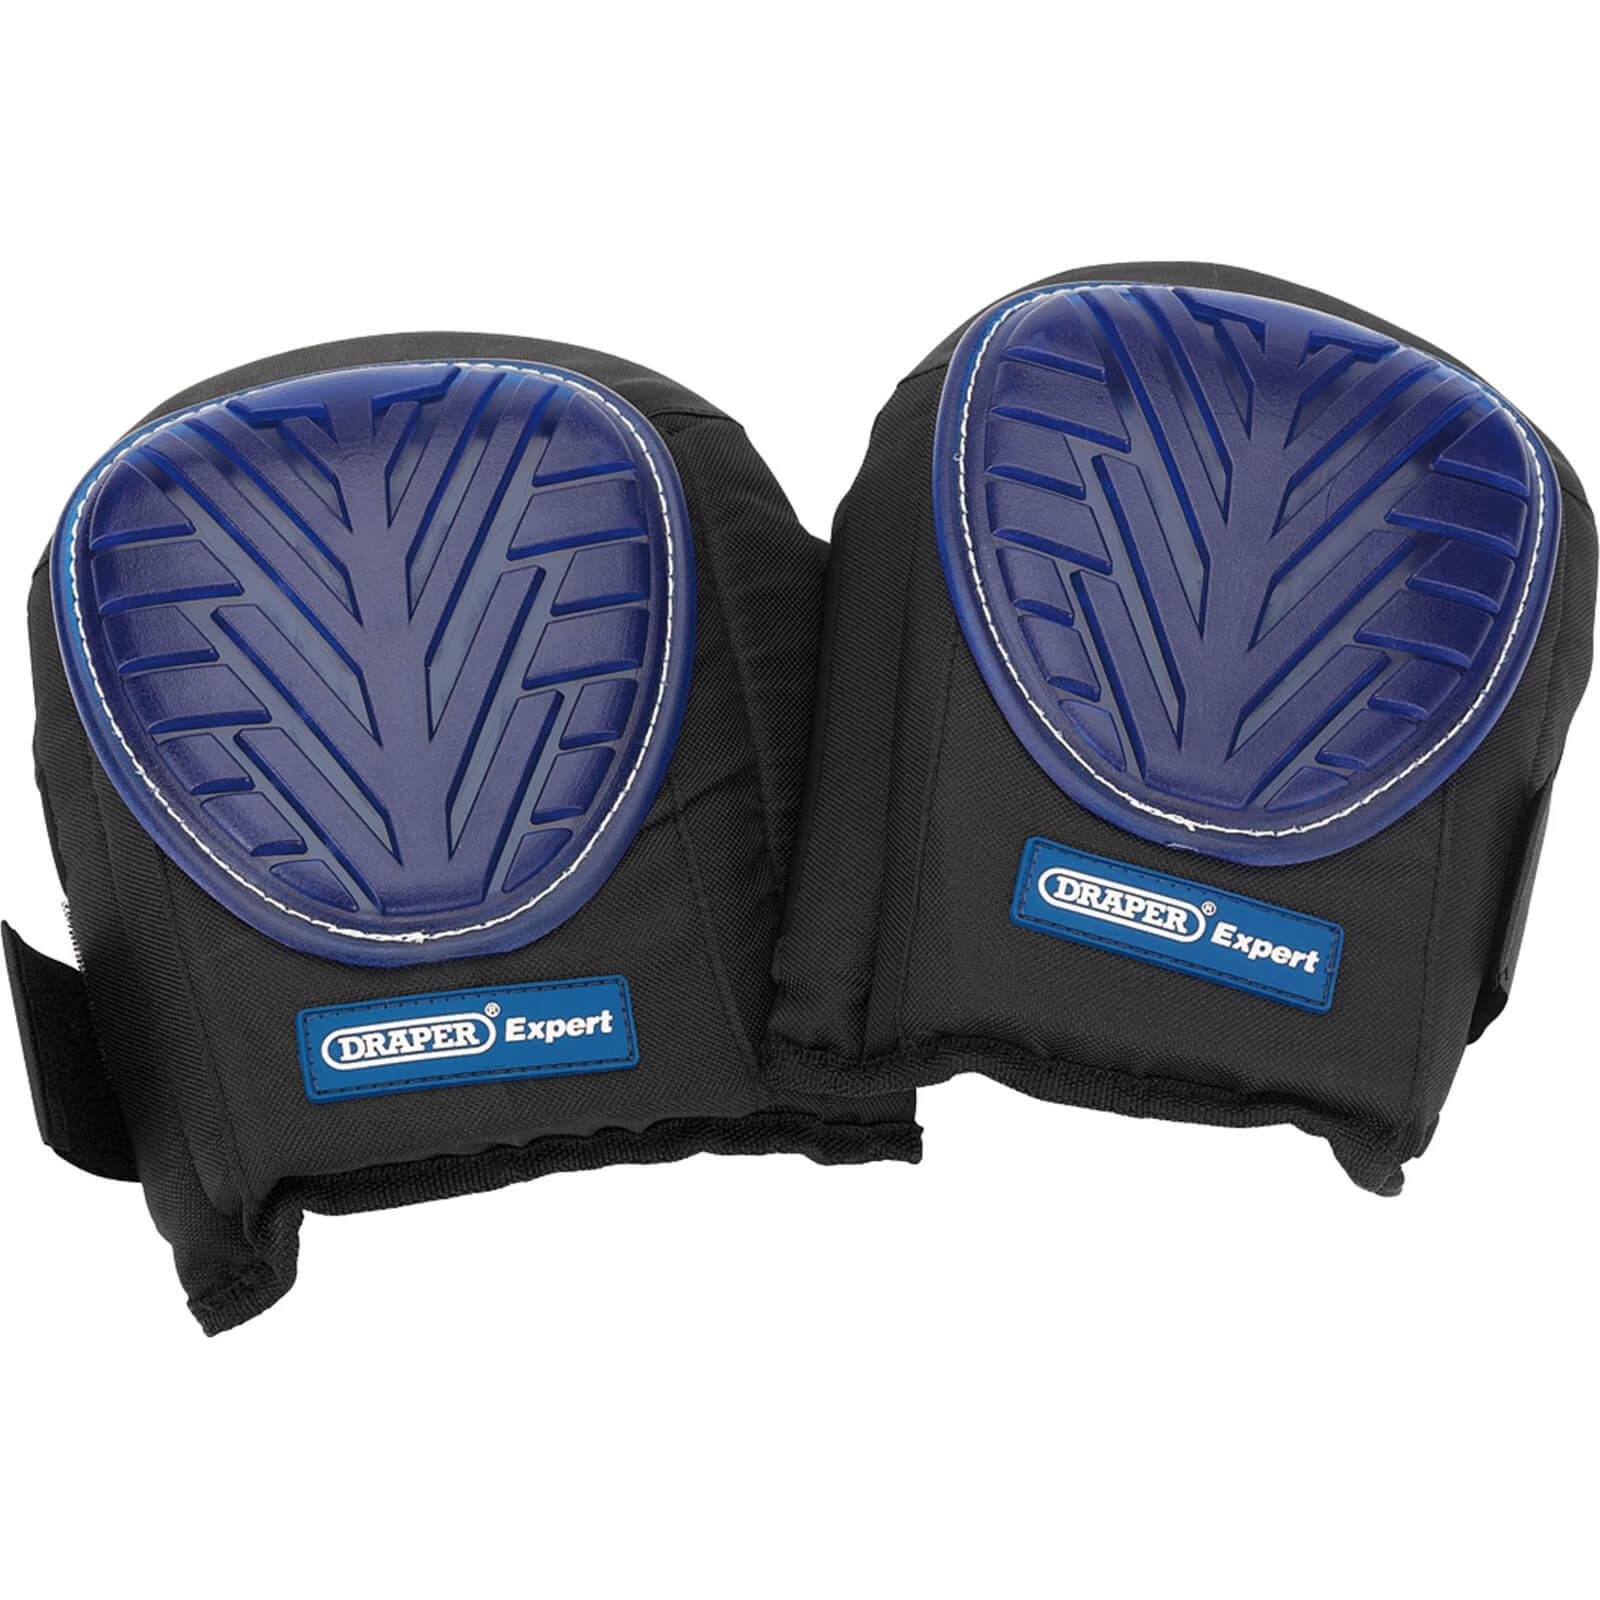 Draper Expert Foam & Gel Knee Pads